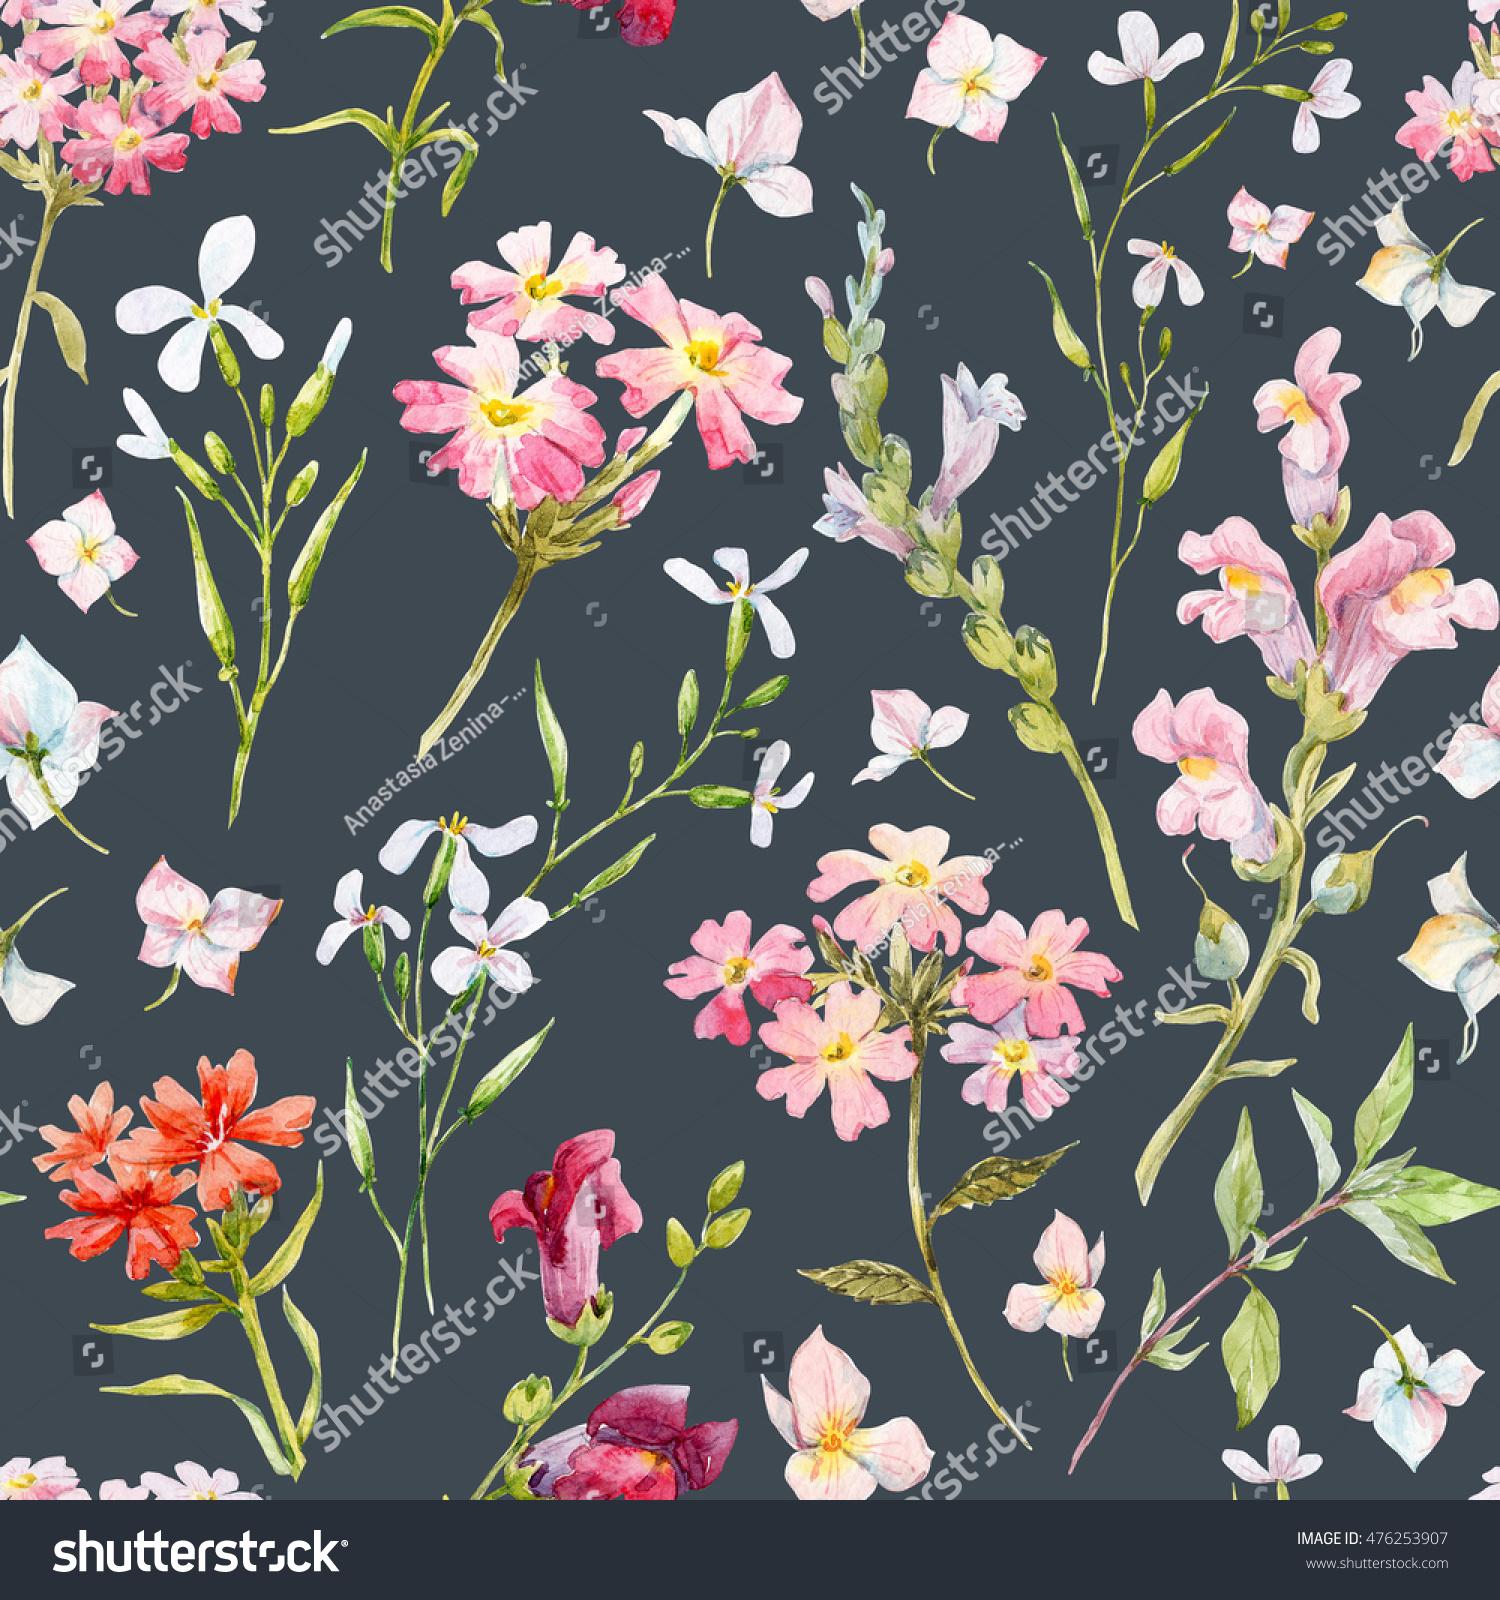 Royalty free stock illustration of watercolor floral pattern watercolor floral pattern delicate flower wallpaper wildflowers pink retroblack background mightylinksfo